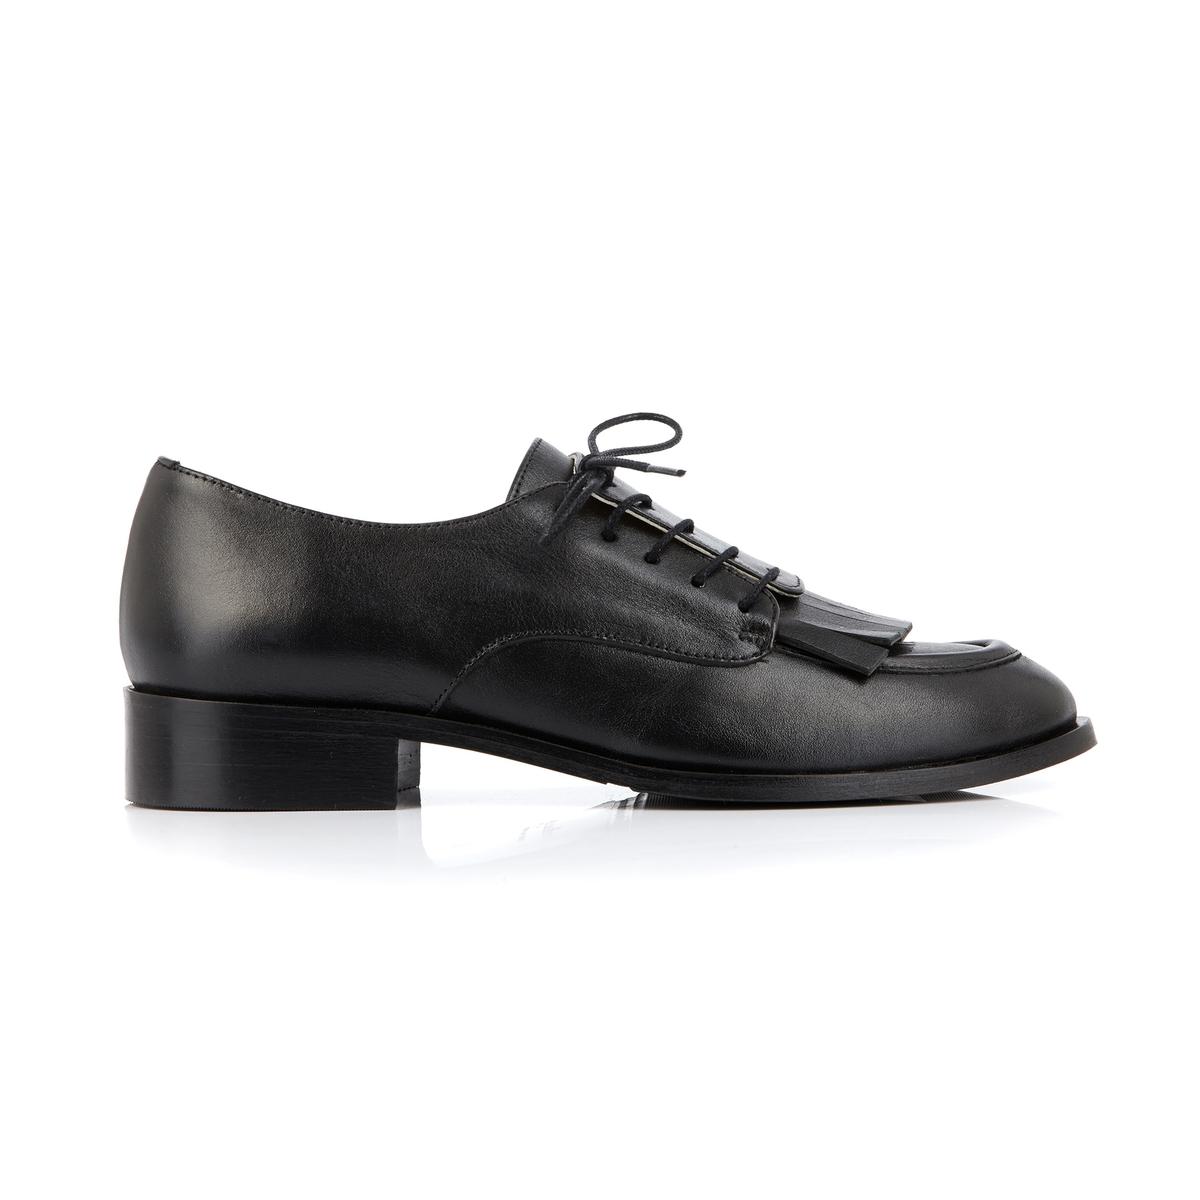 Ботинки кожаные Epine